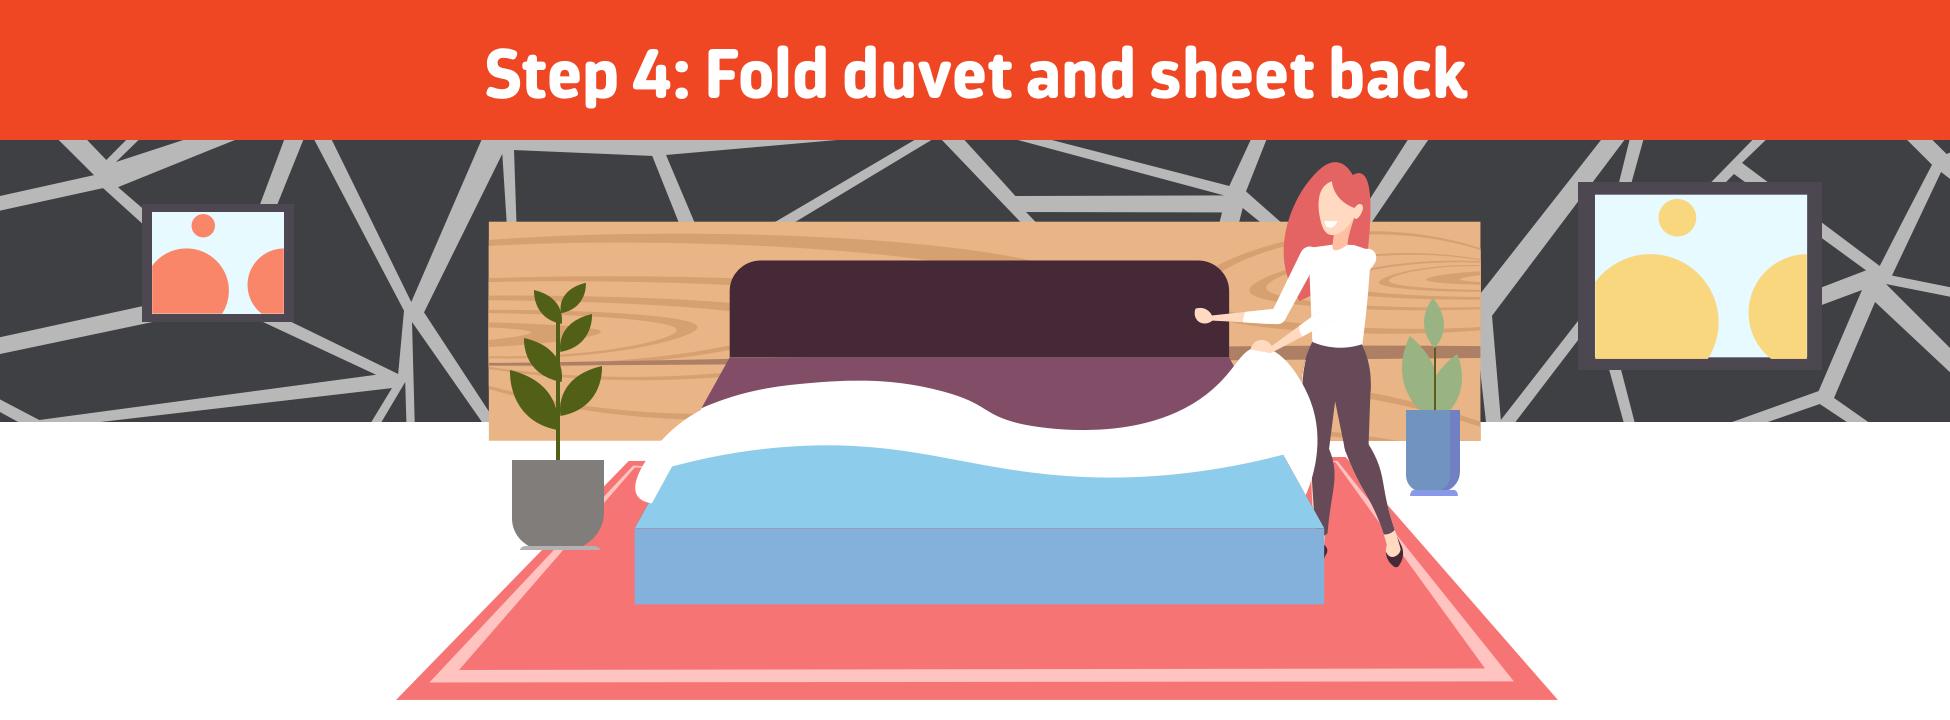 Fold duvet and sheet back